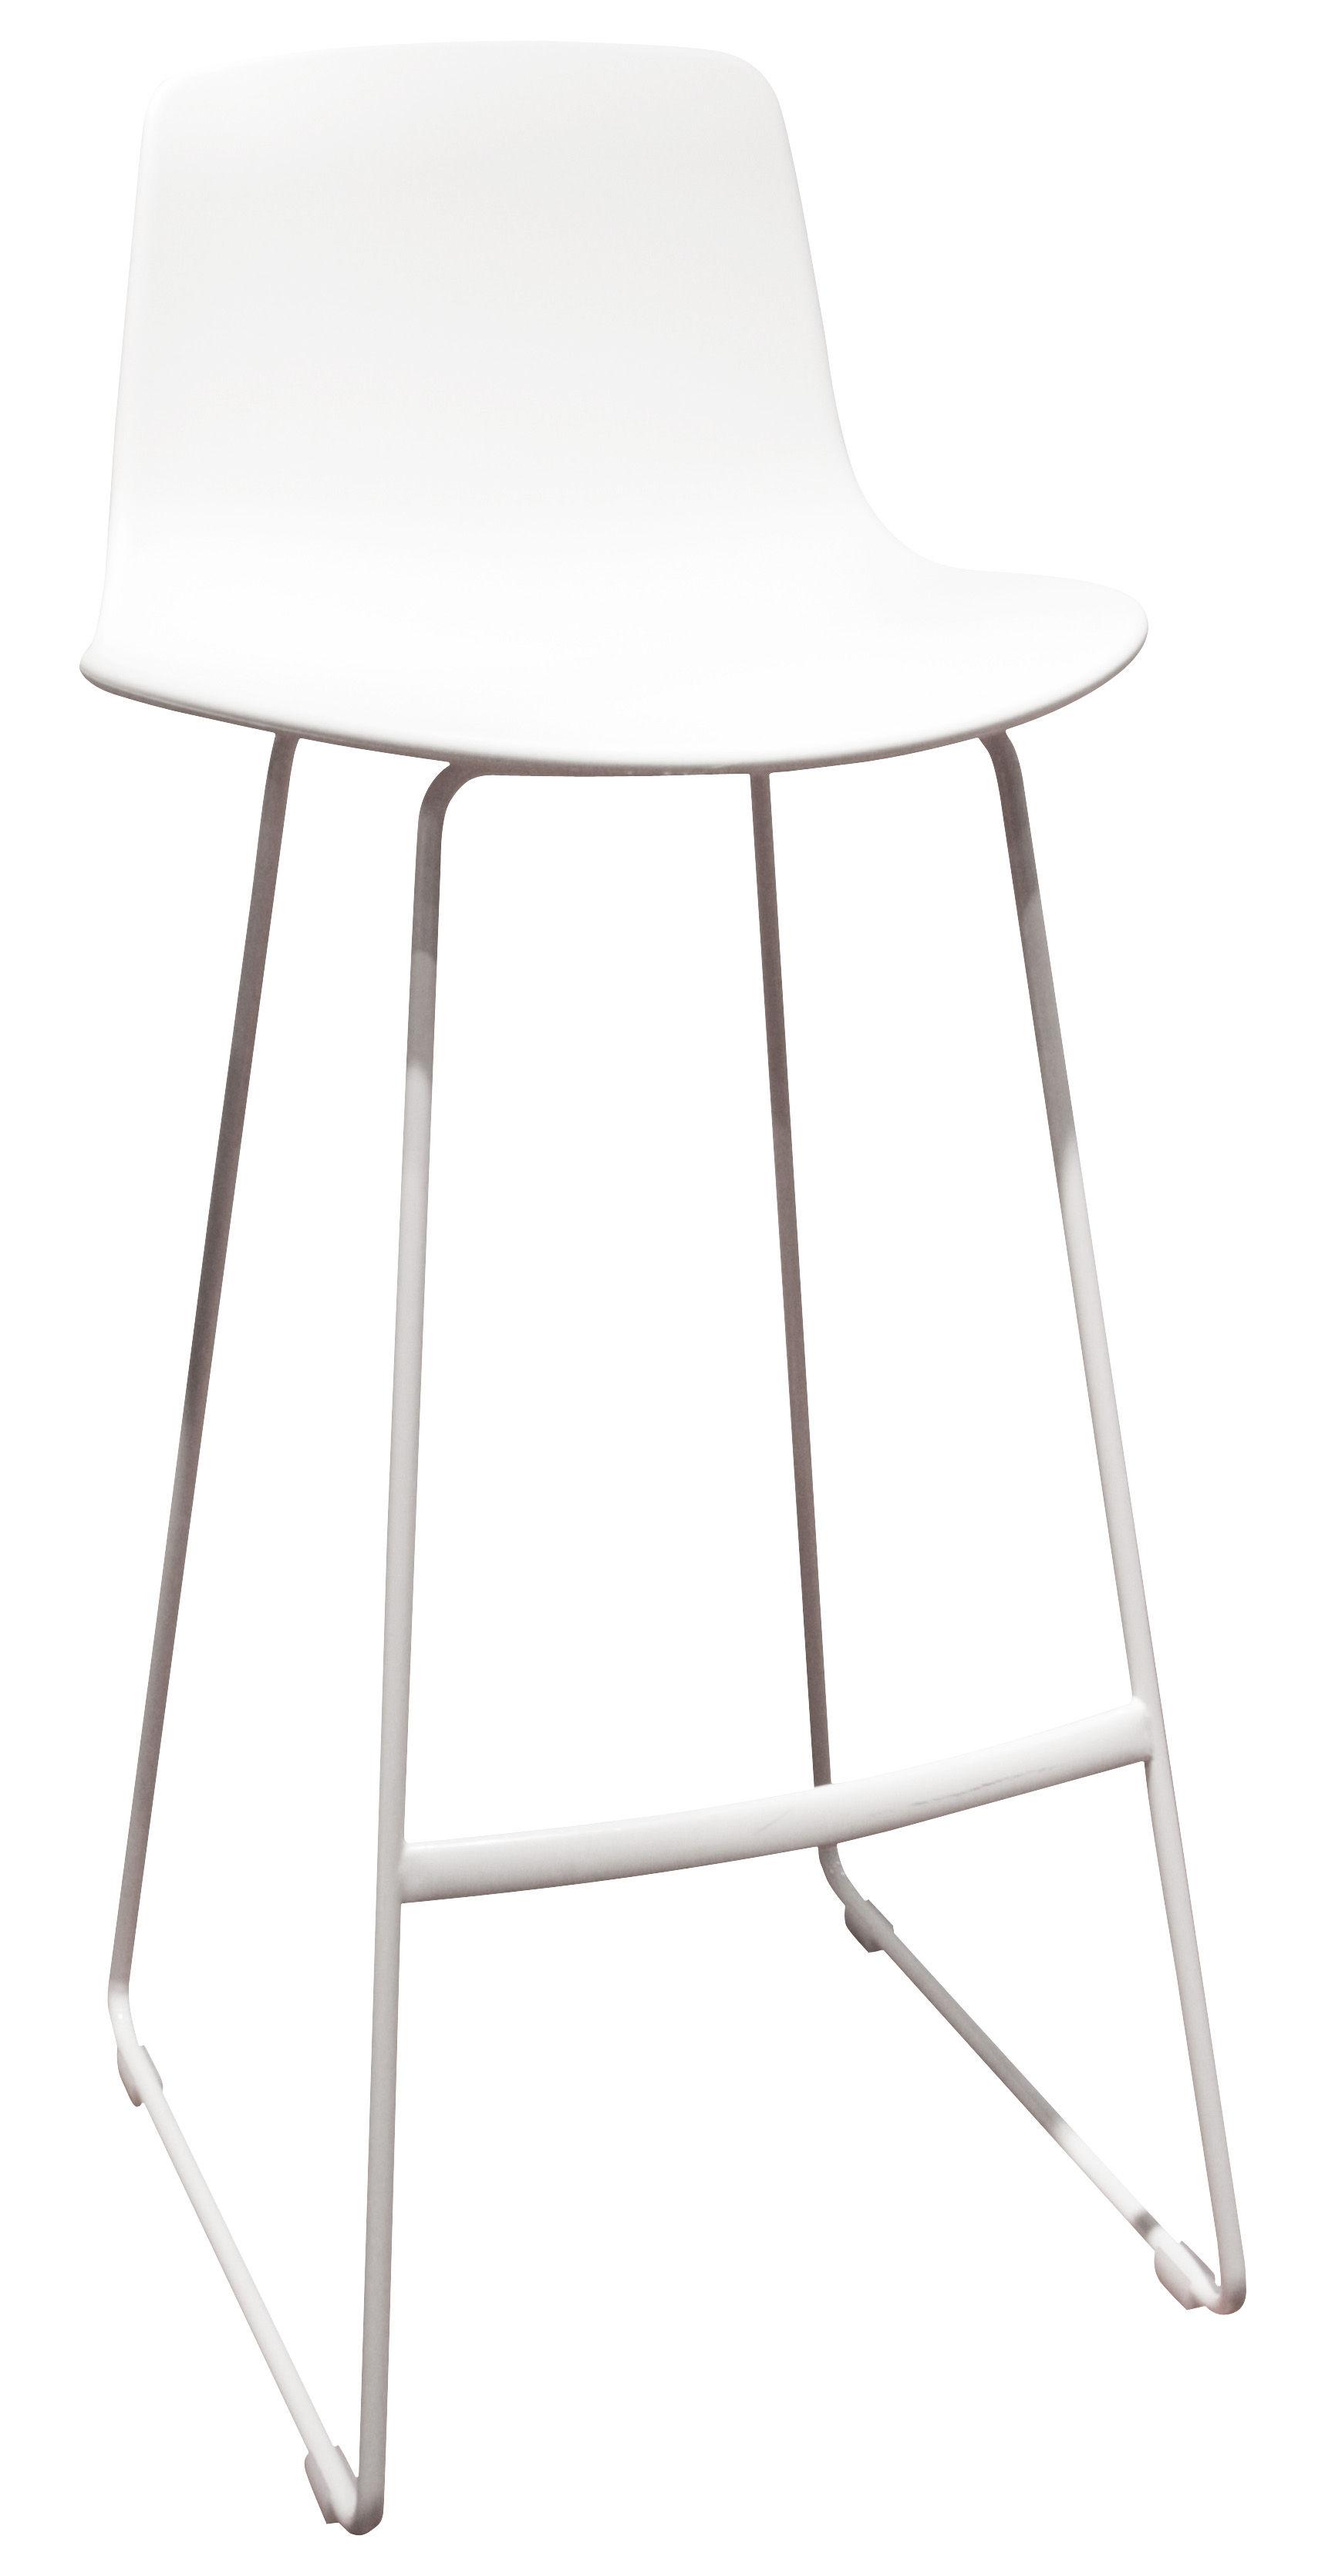 Möbel - Barhocker - Lottus Hochstuhl Kufengestell - Enea - Weiß - Polypropylen, Stahl